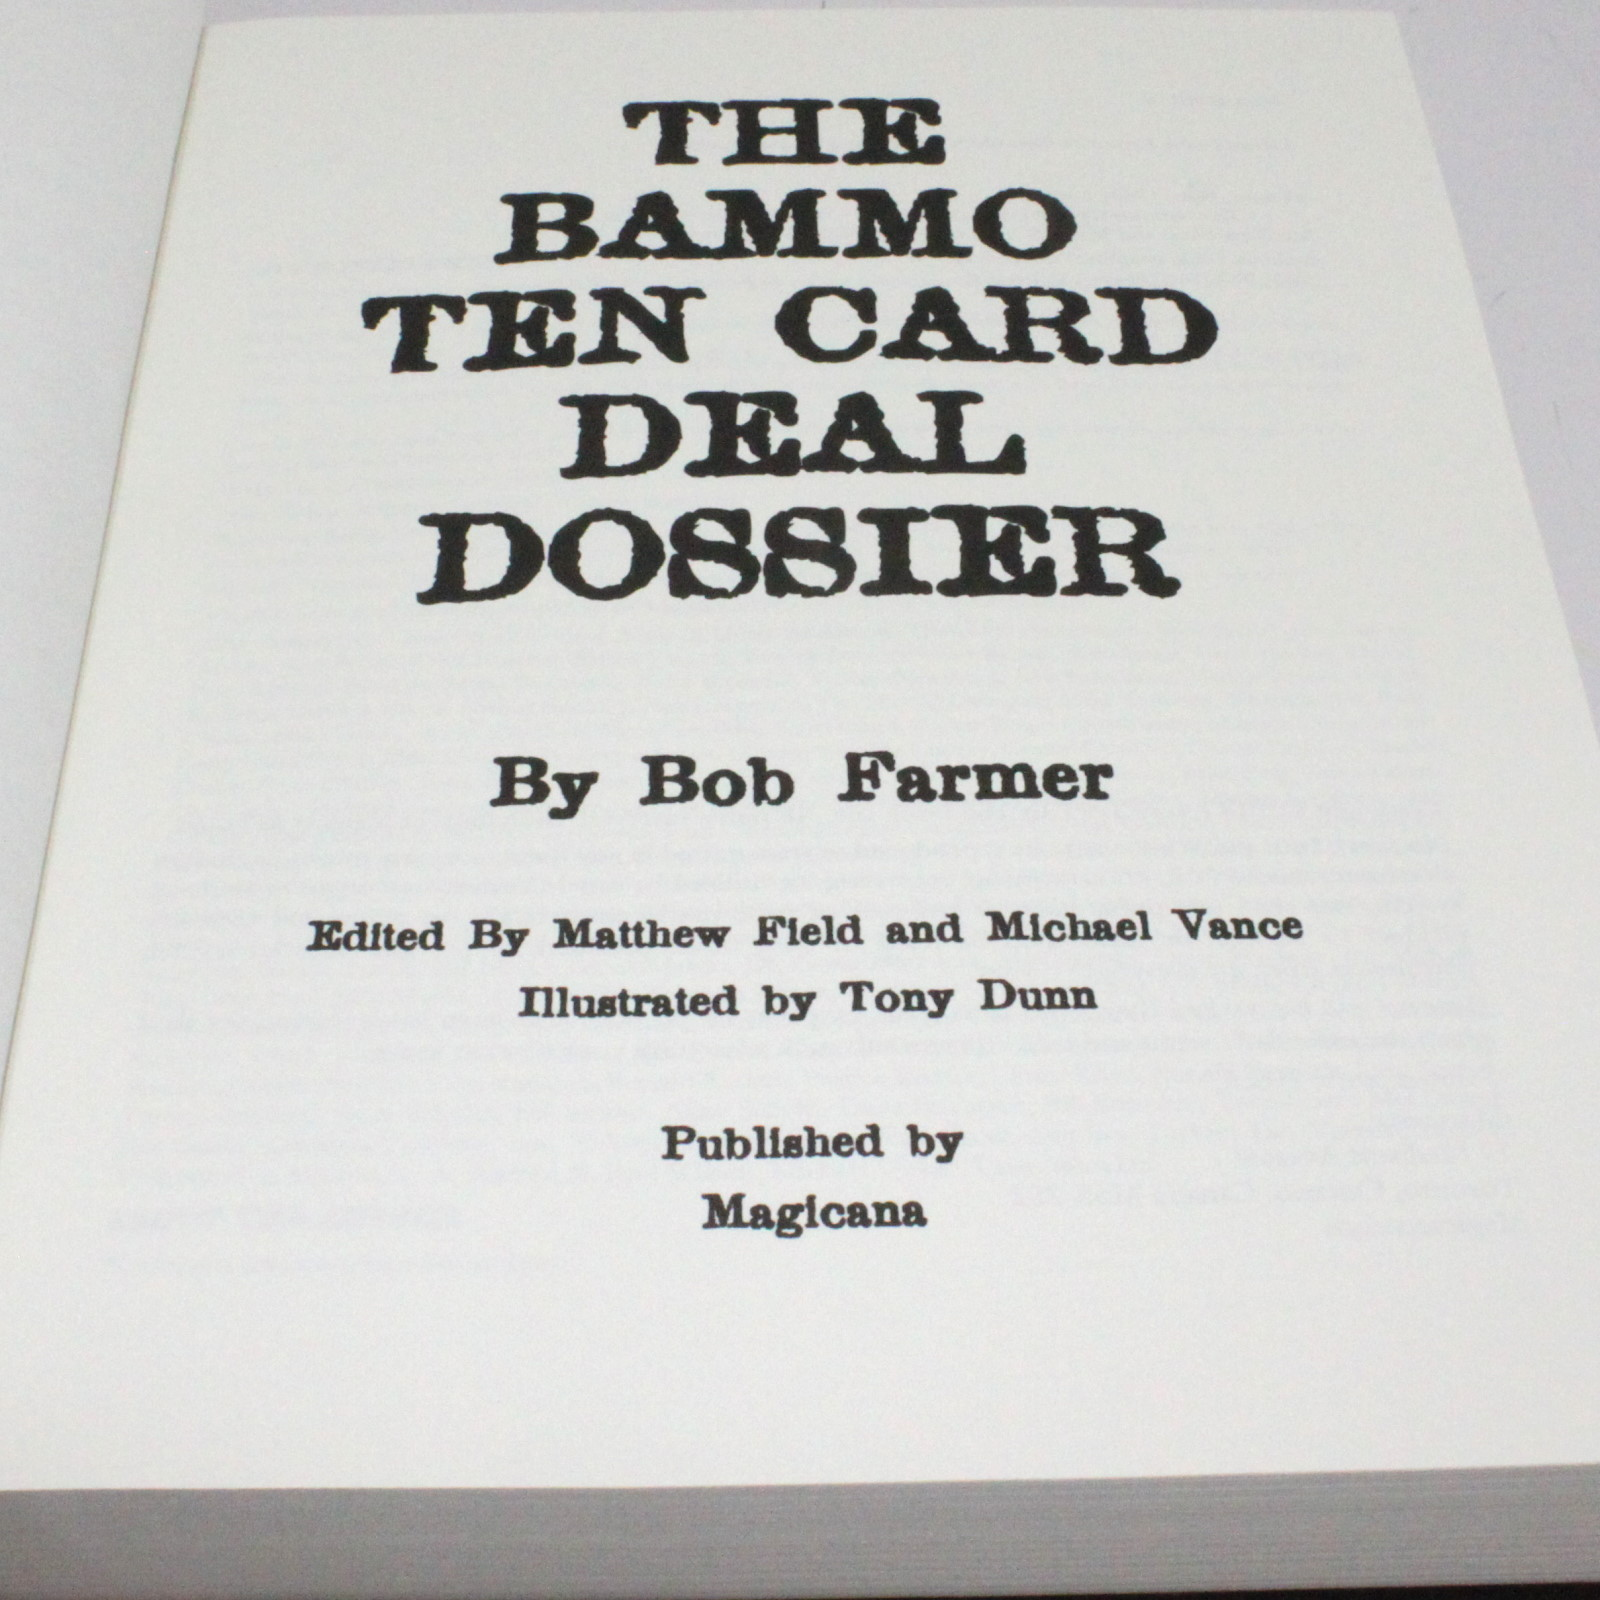 The Bammo Ten Card Deal Dossier by Bob Farmer